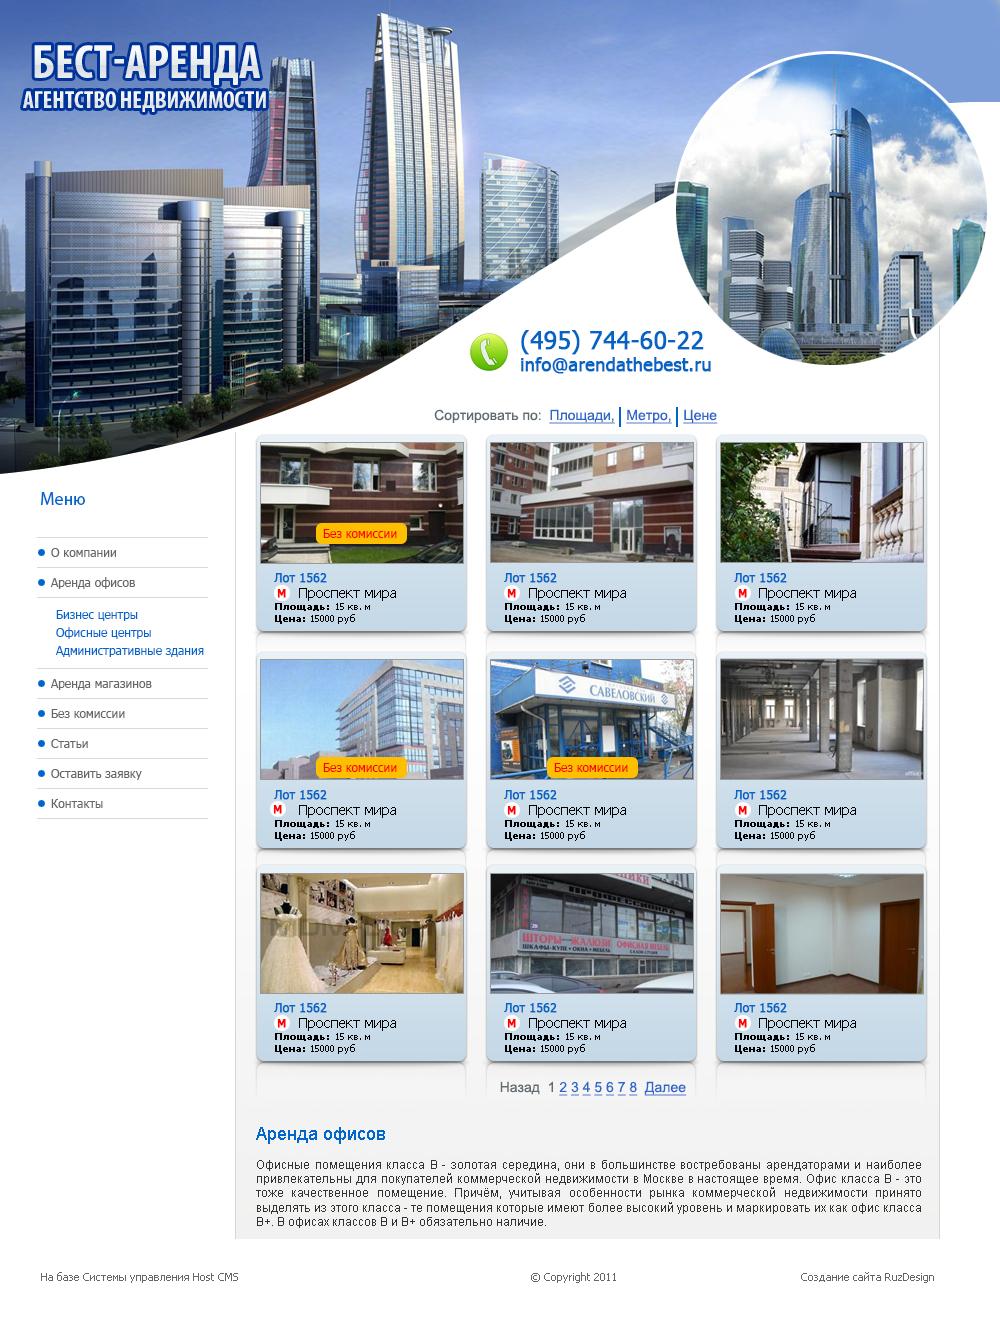 Создание сайта под ключ - Аренда офисов - Агентство недвижимости ...